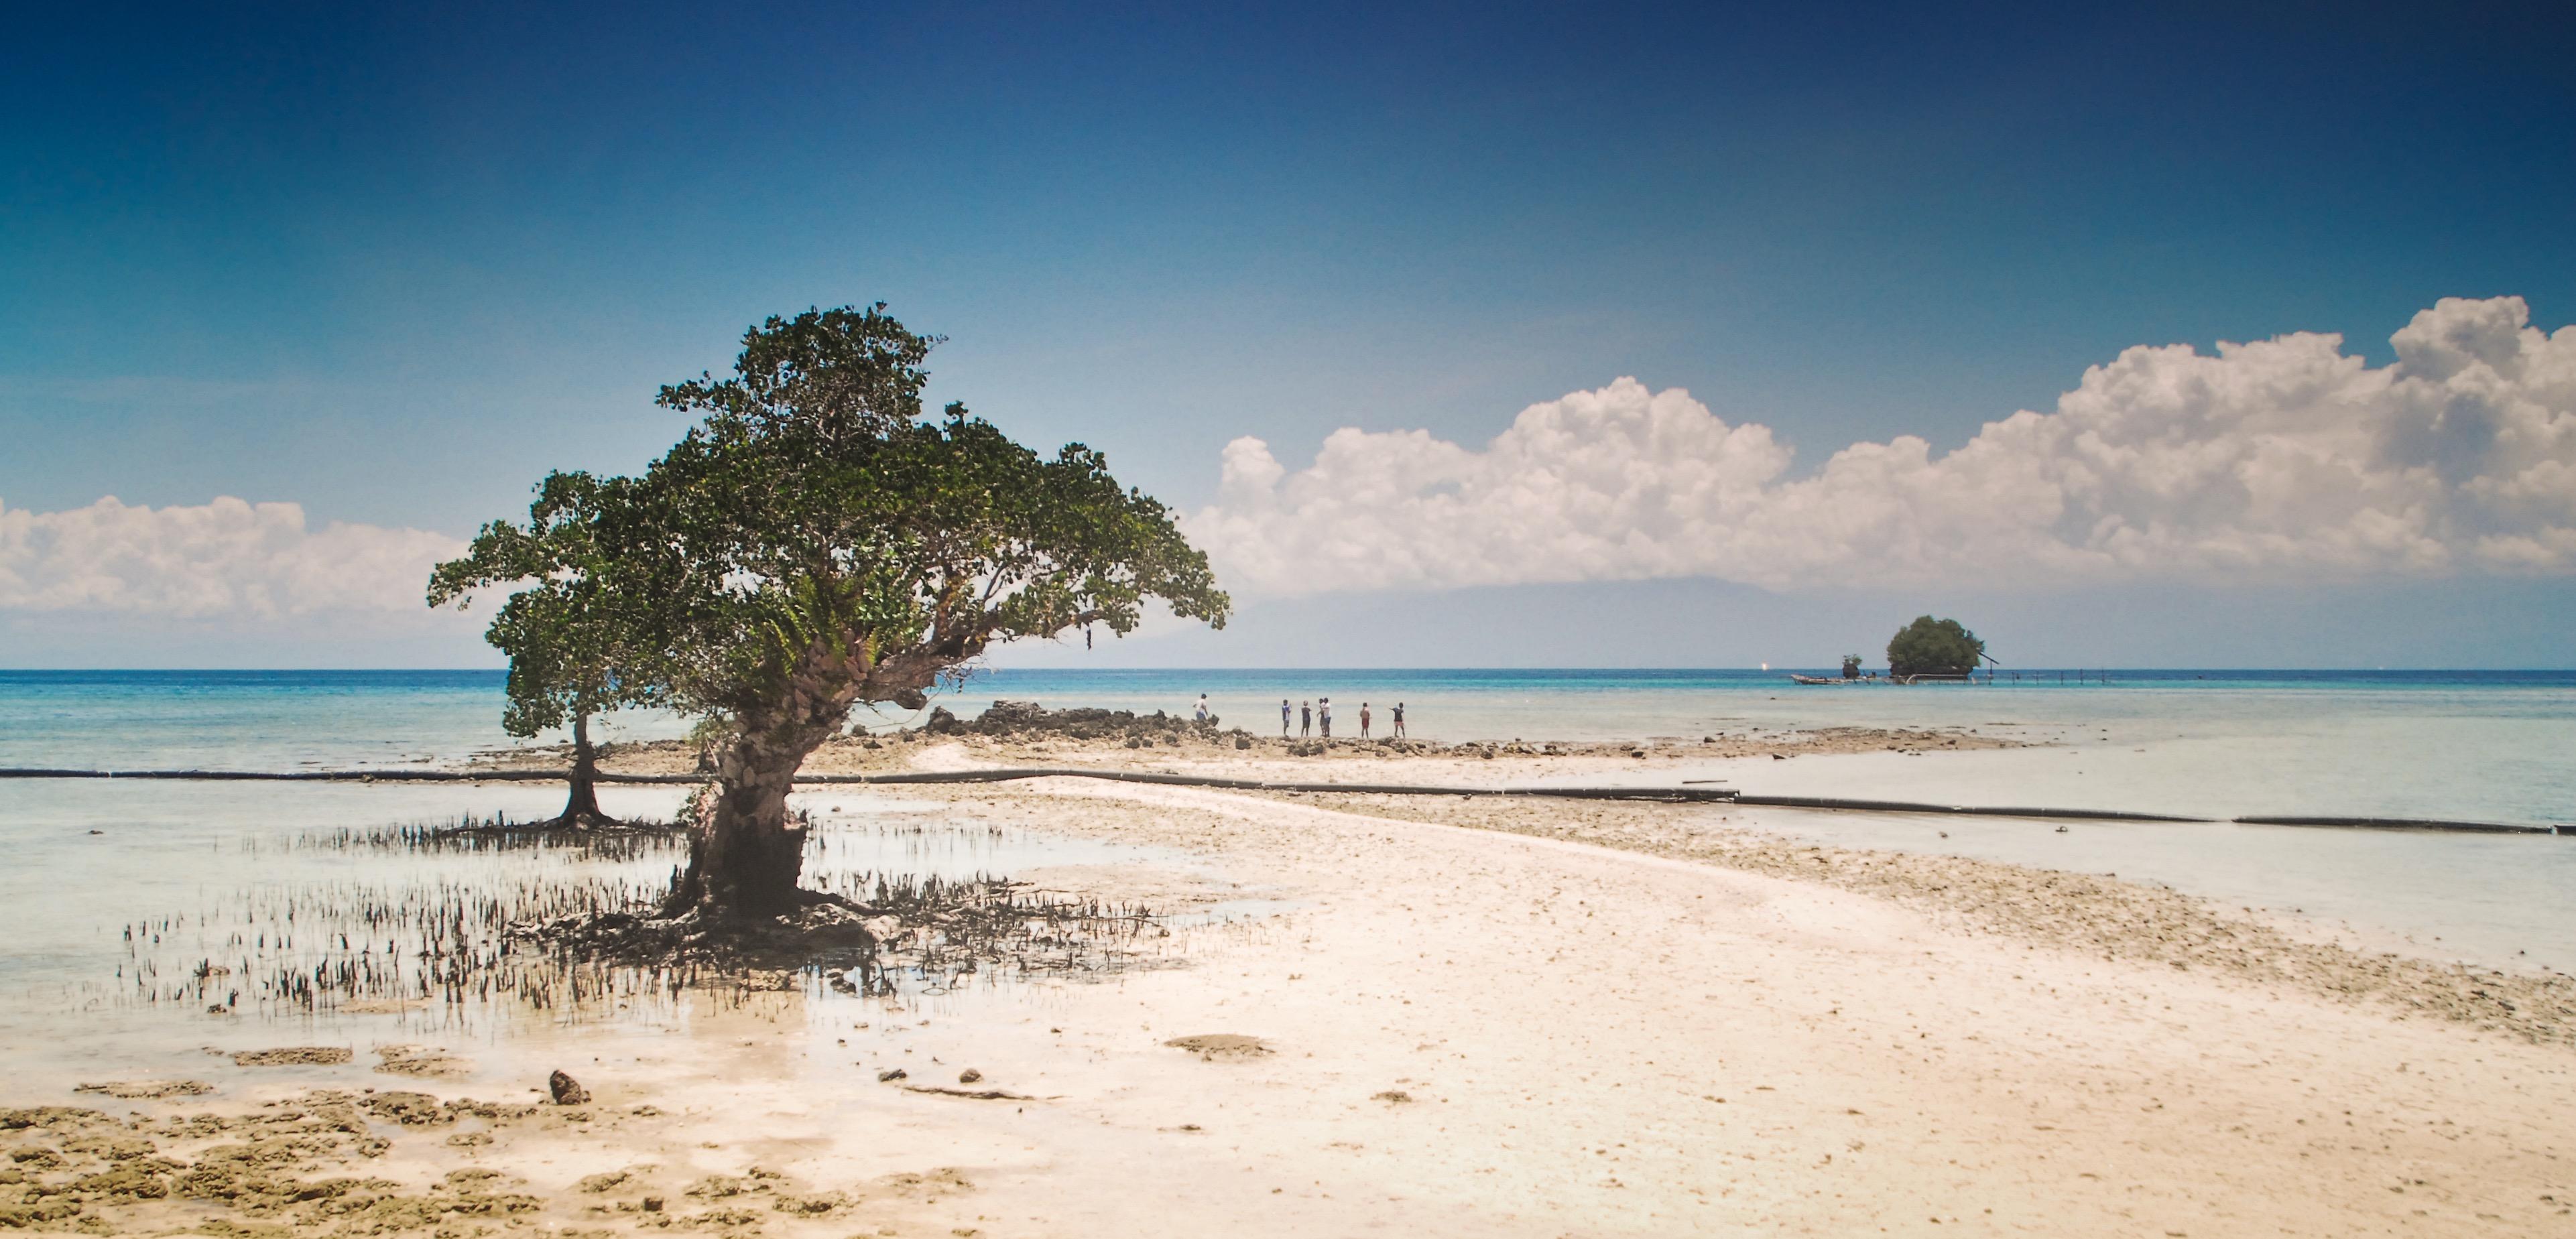 A lone mangrove looks like a sentinel of the long white rough sand bar. Eco-Spiritual Pilgrimage. Ateneo High School. Photo: Mr. Bok Pioquid, CSIP, AHS